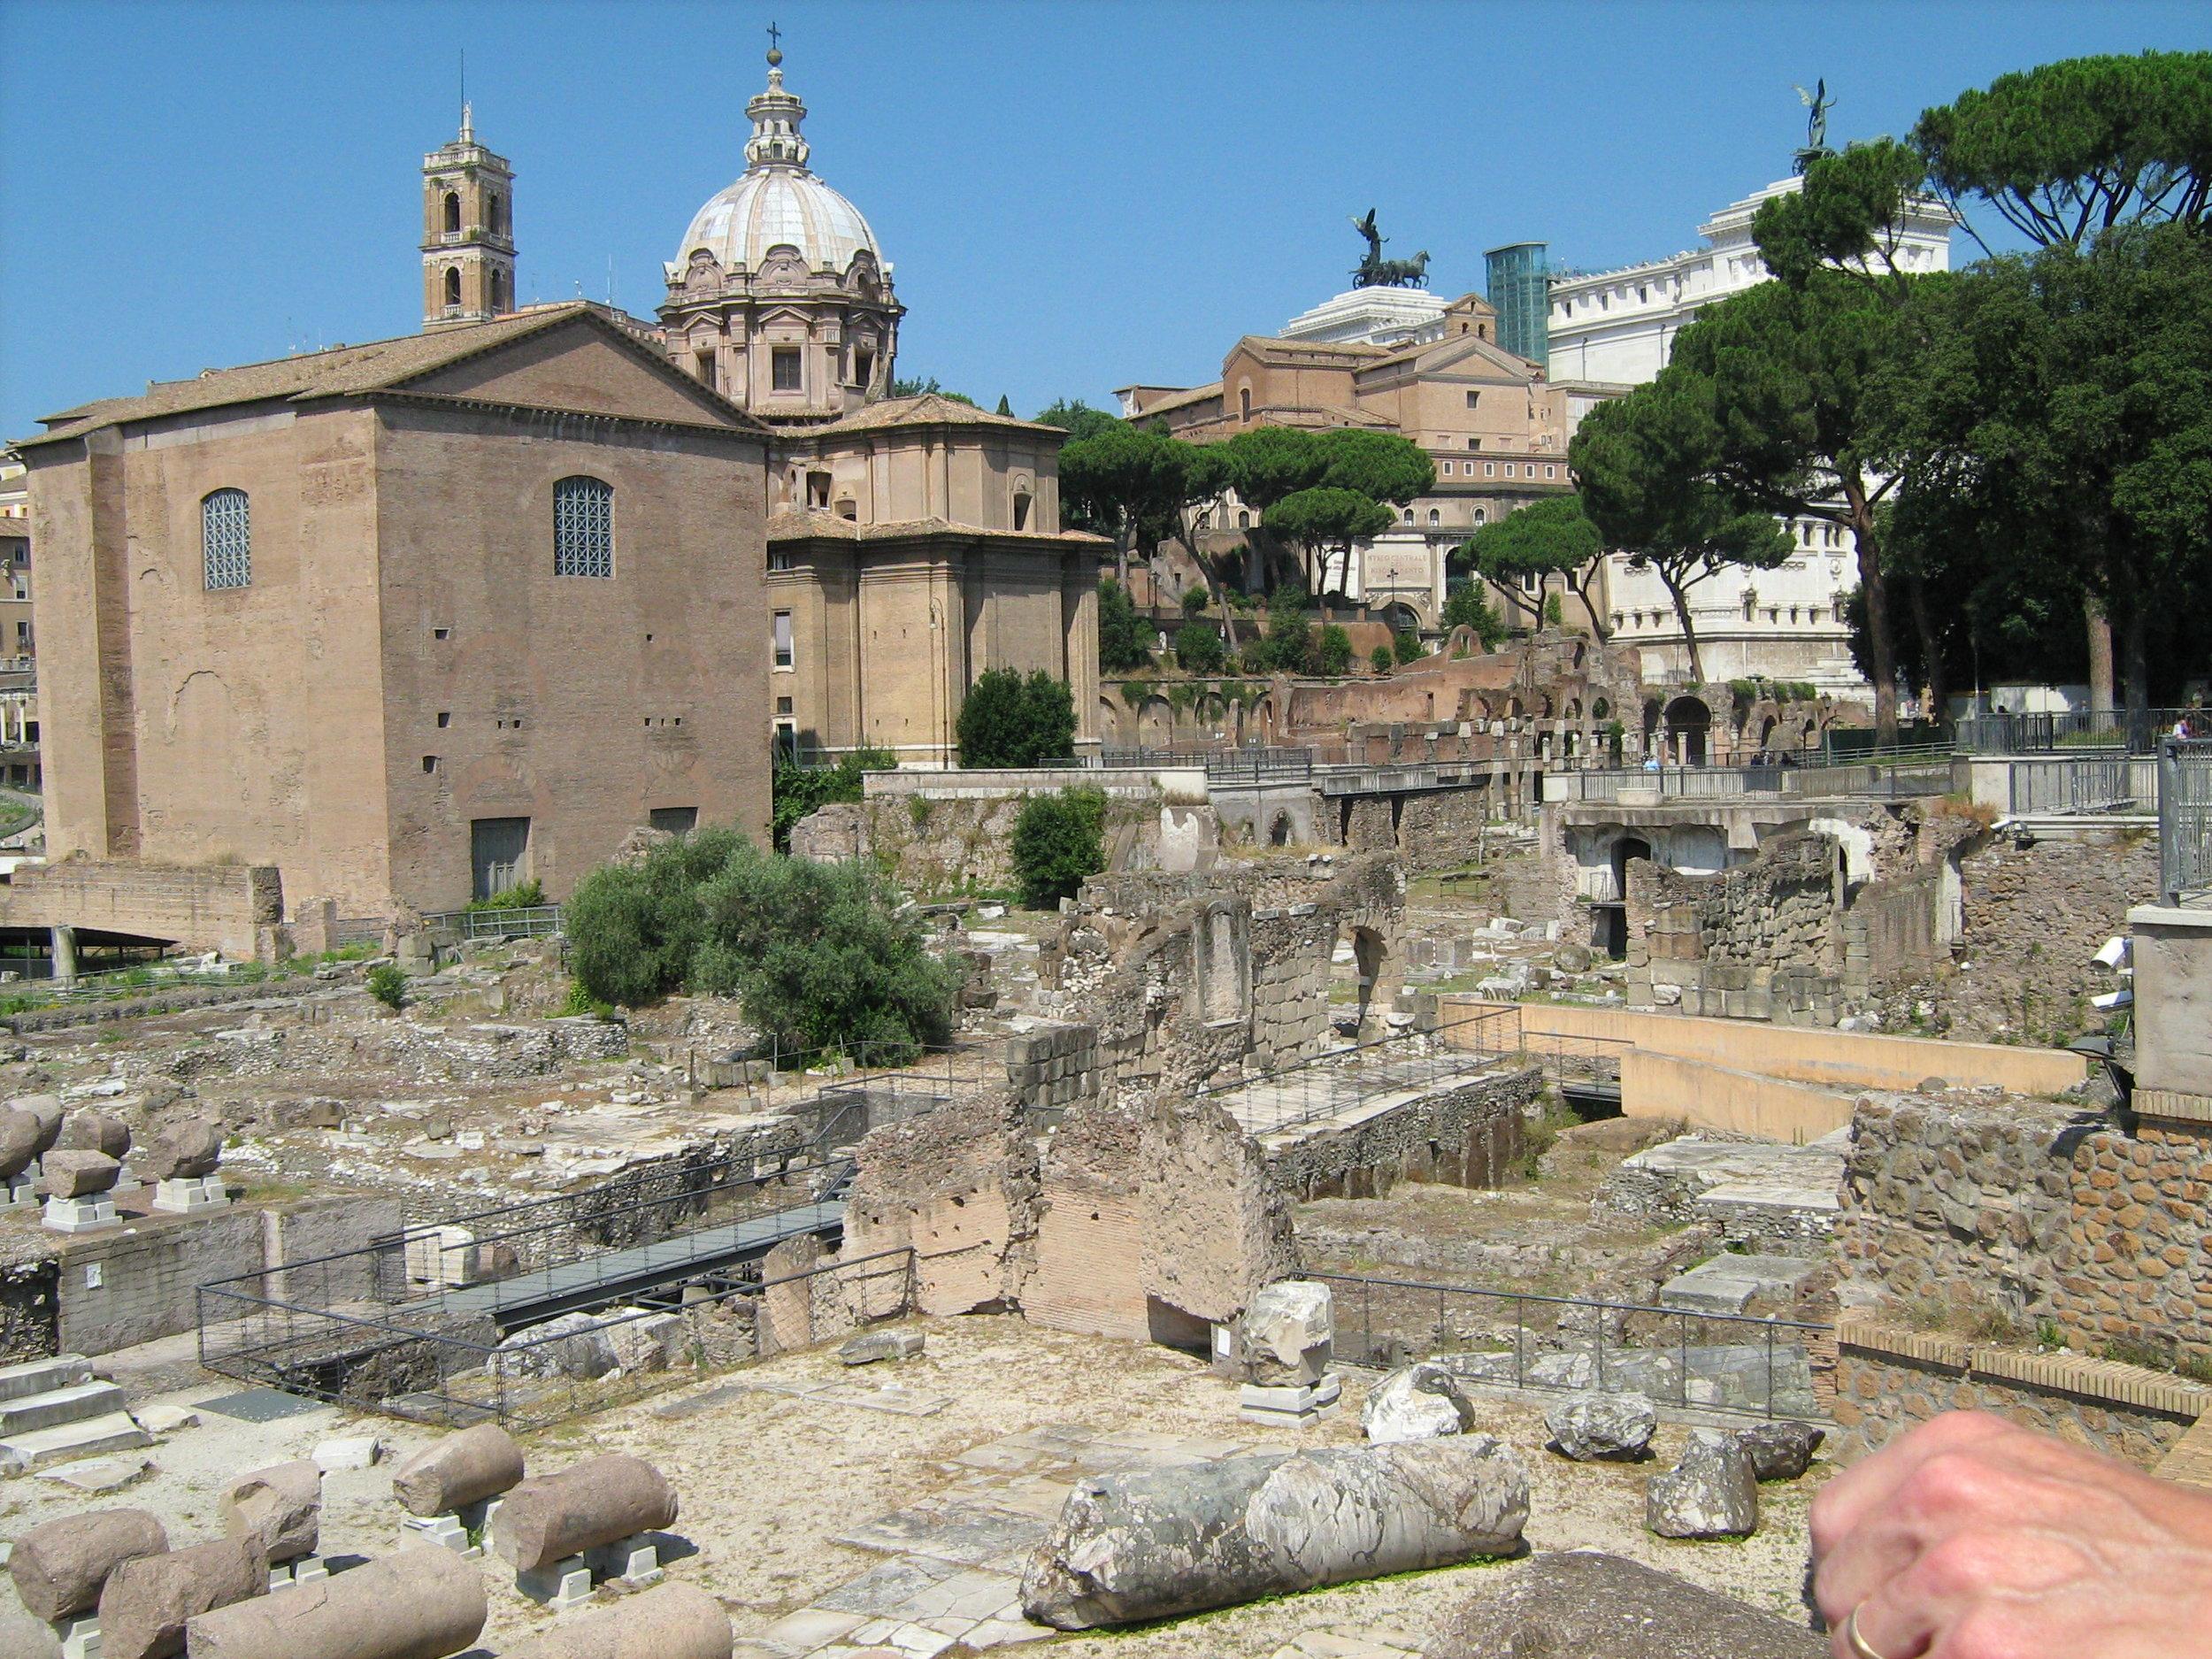 CRO Italy web 2013 - 076.JPG